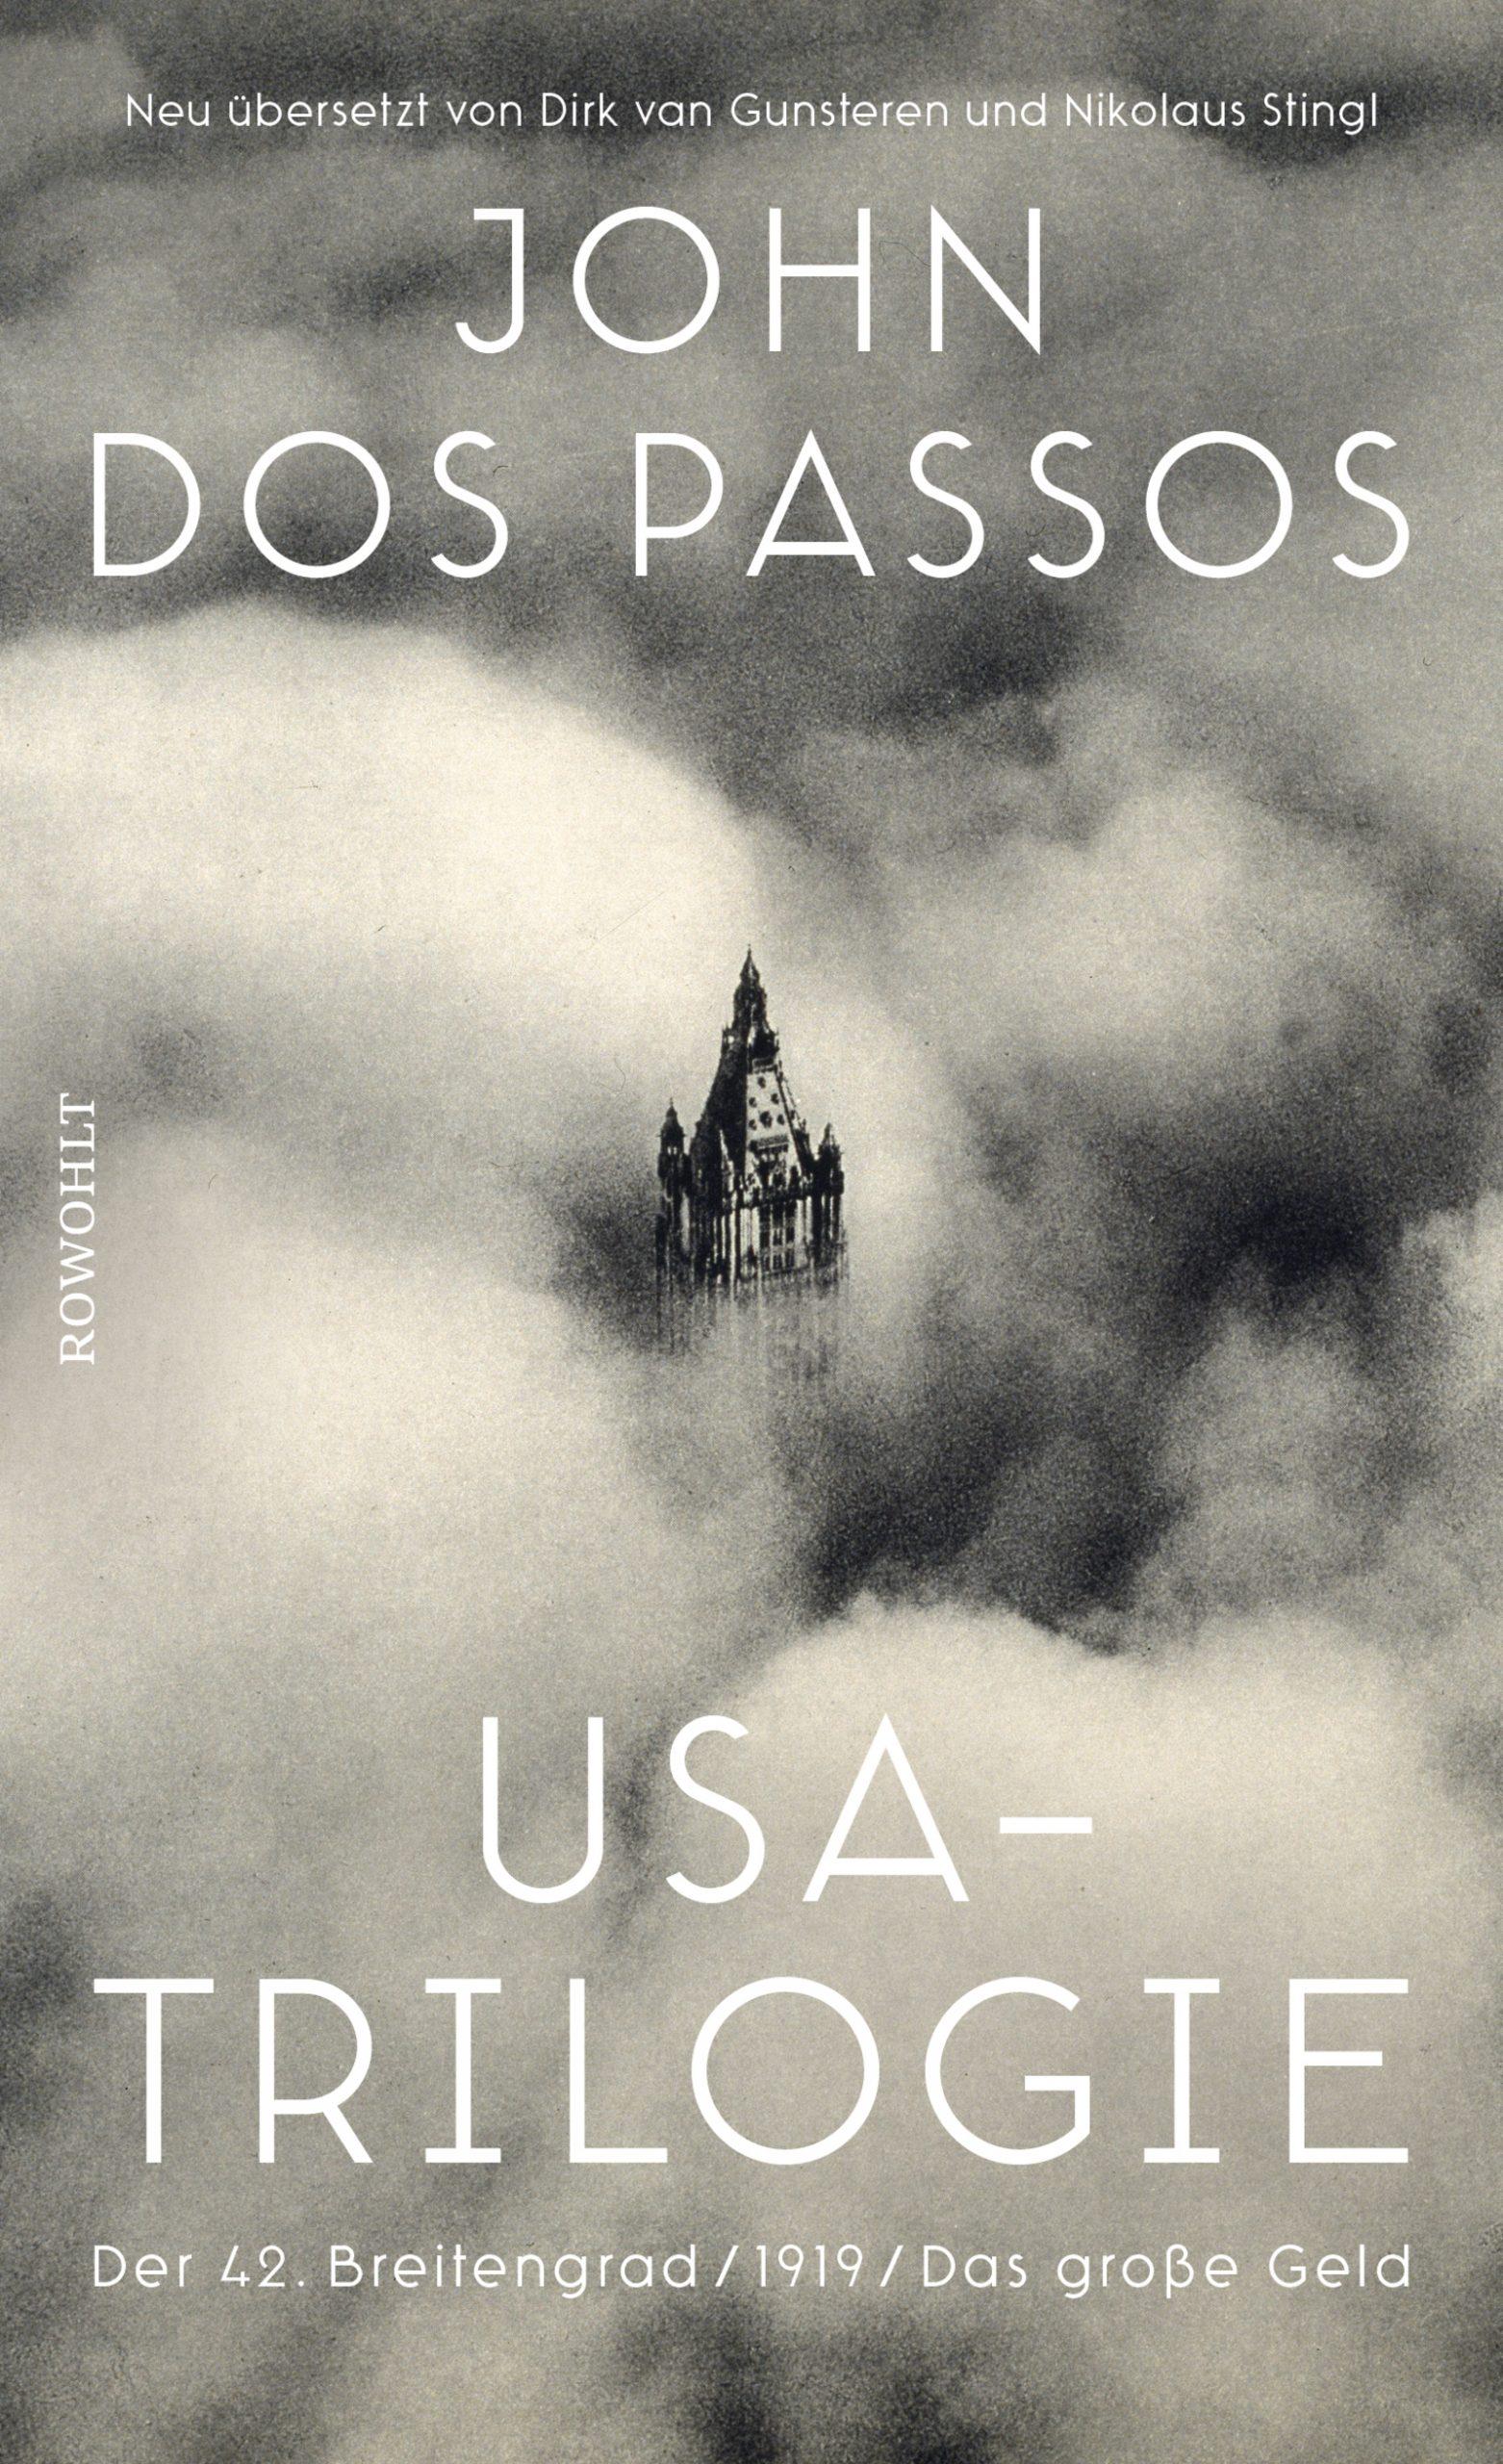 John Dos Passos — Anatomie einer Metamorphose